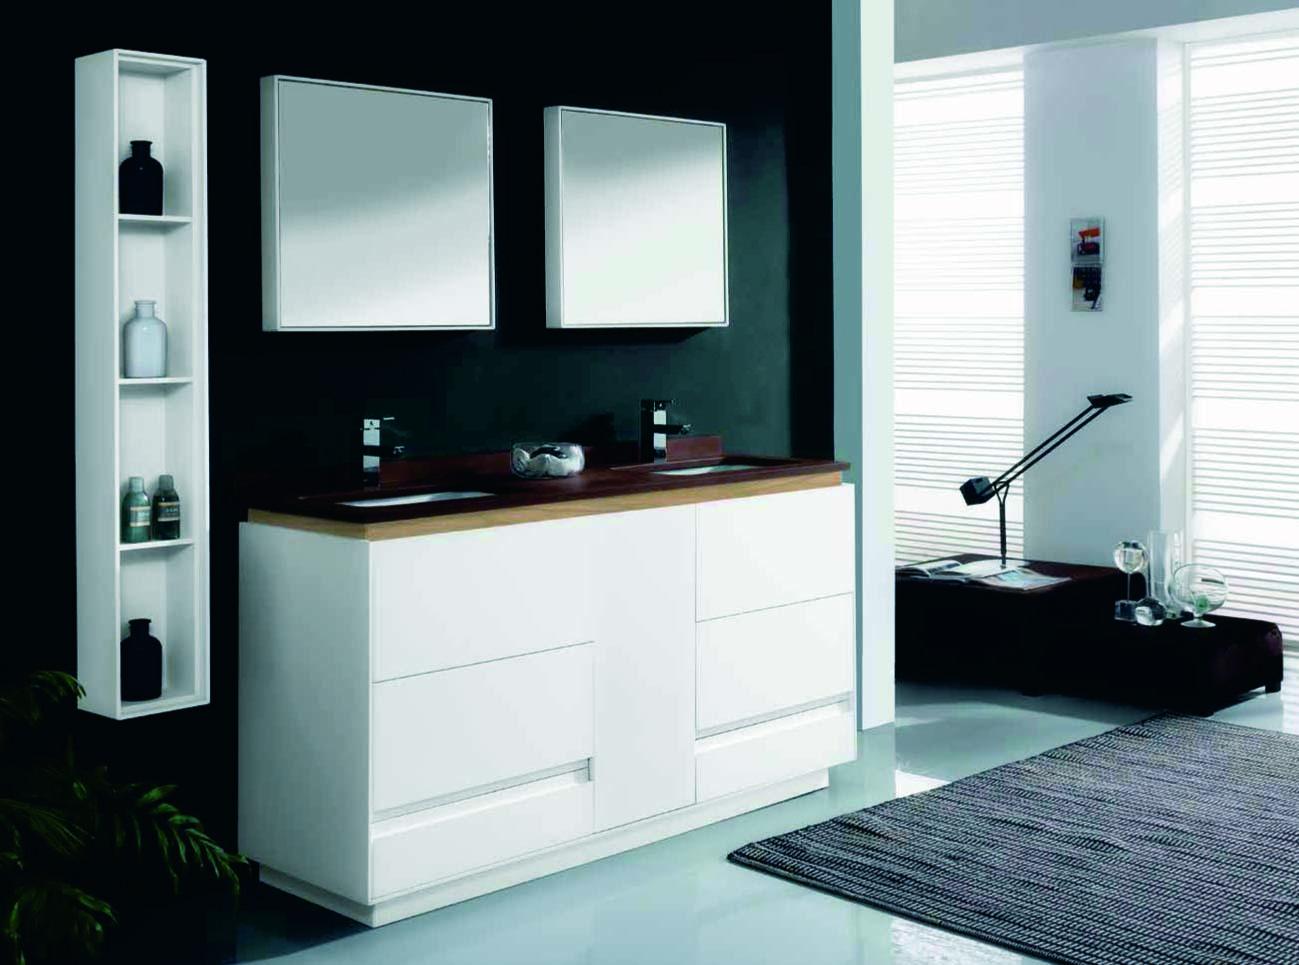 Muebles lavabo en aki for Muebles de bano aki